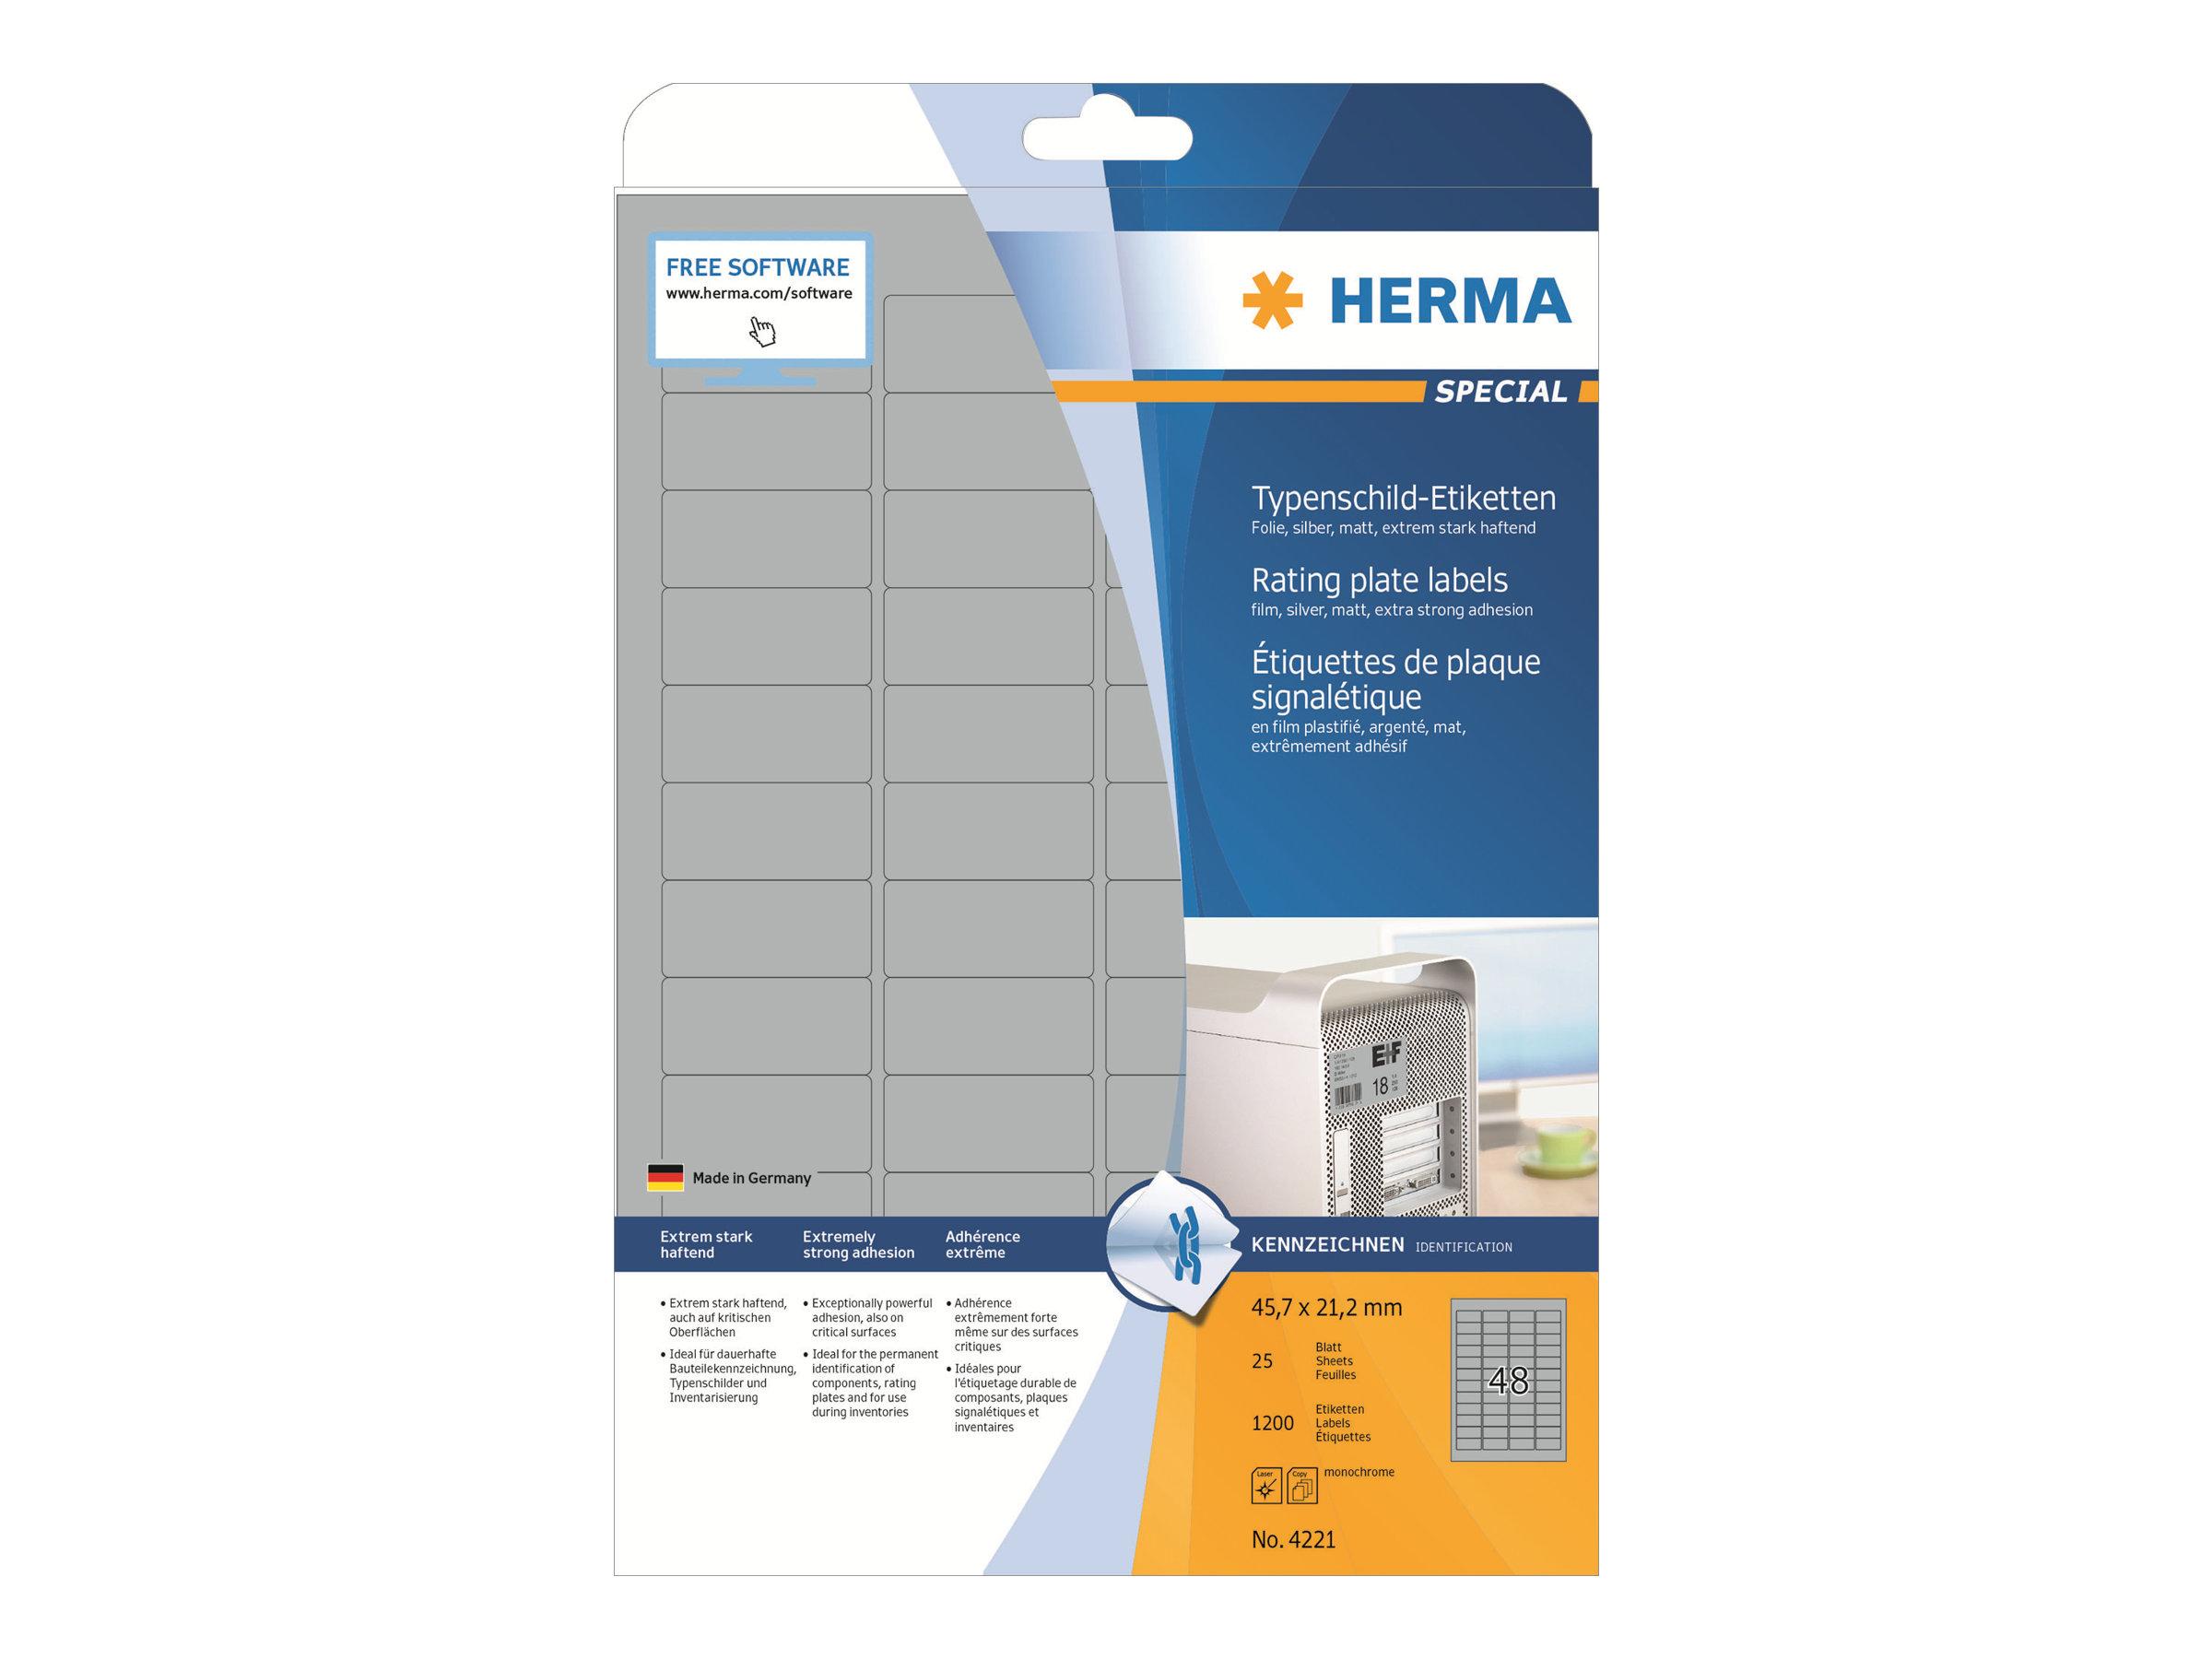 HERMA Special - Polyester - matt - permanent selbstklebend - Silber - 45.7 x 21.2 mm 1200 Etikett(en) (25 Bogen x 48)